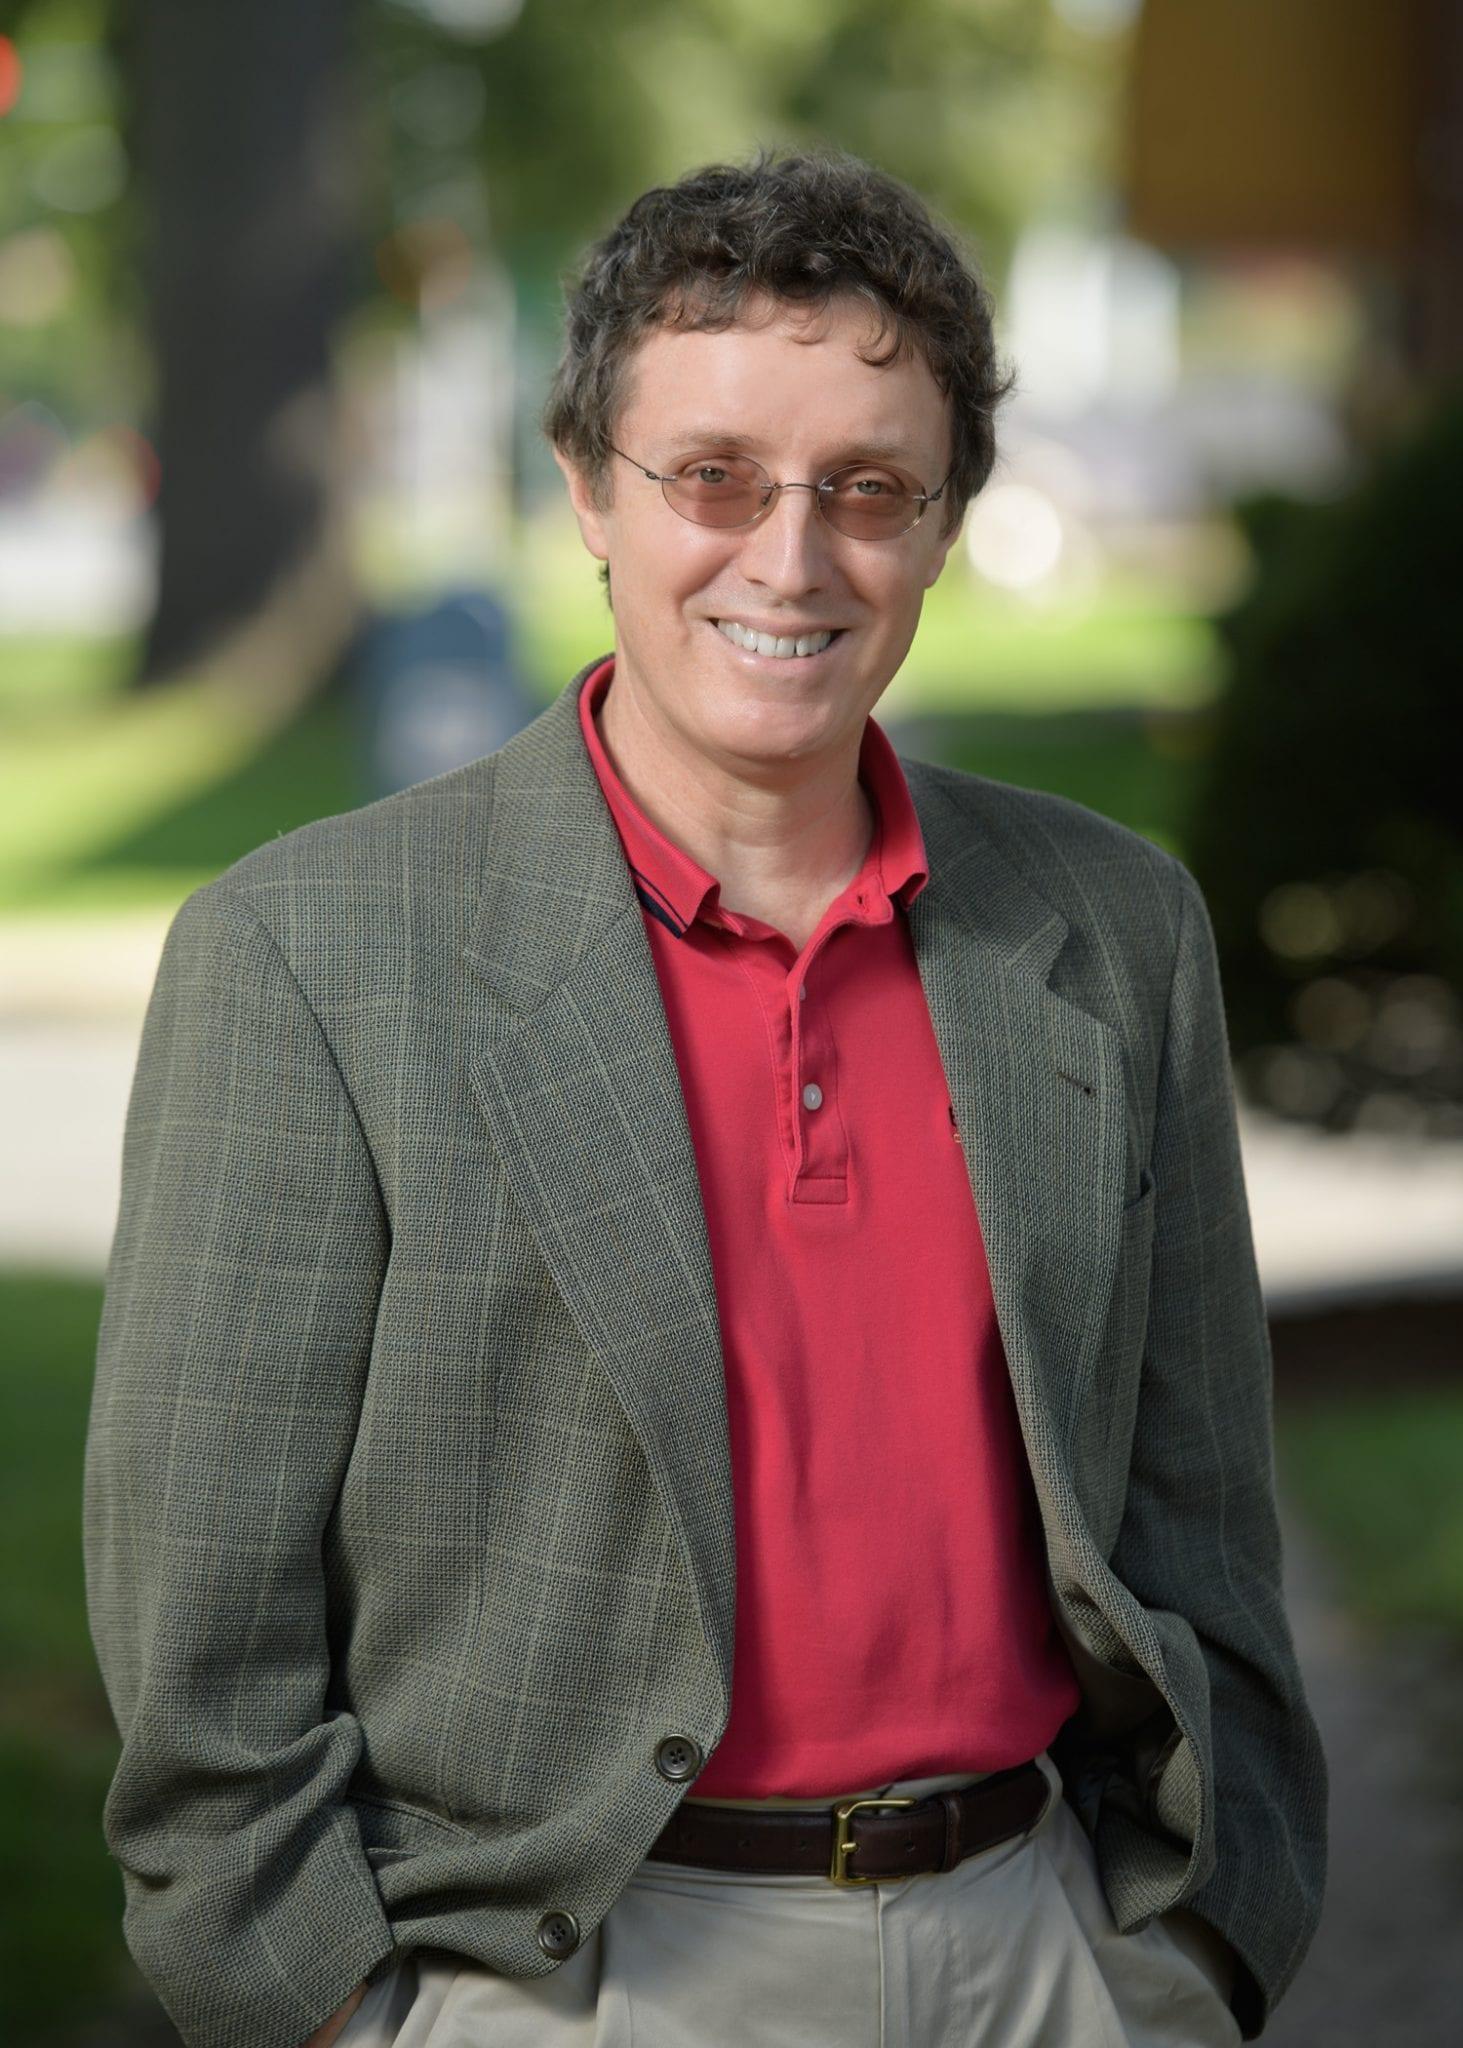 Salvatore J. Pizzanelli